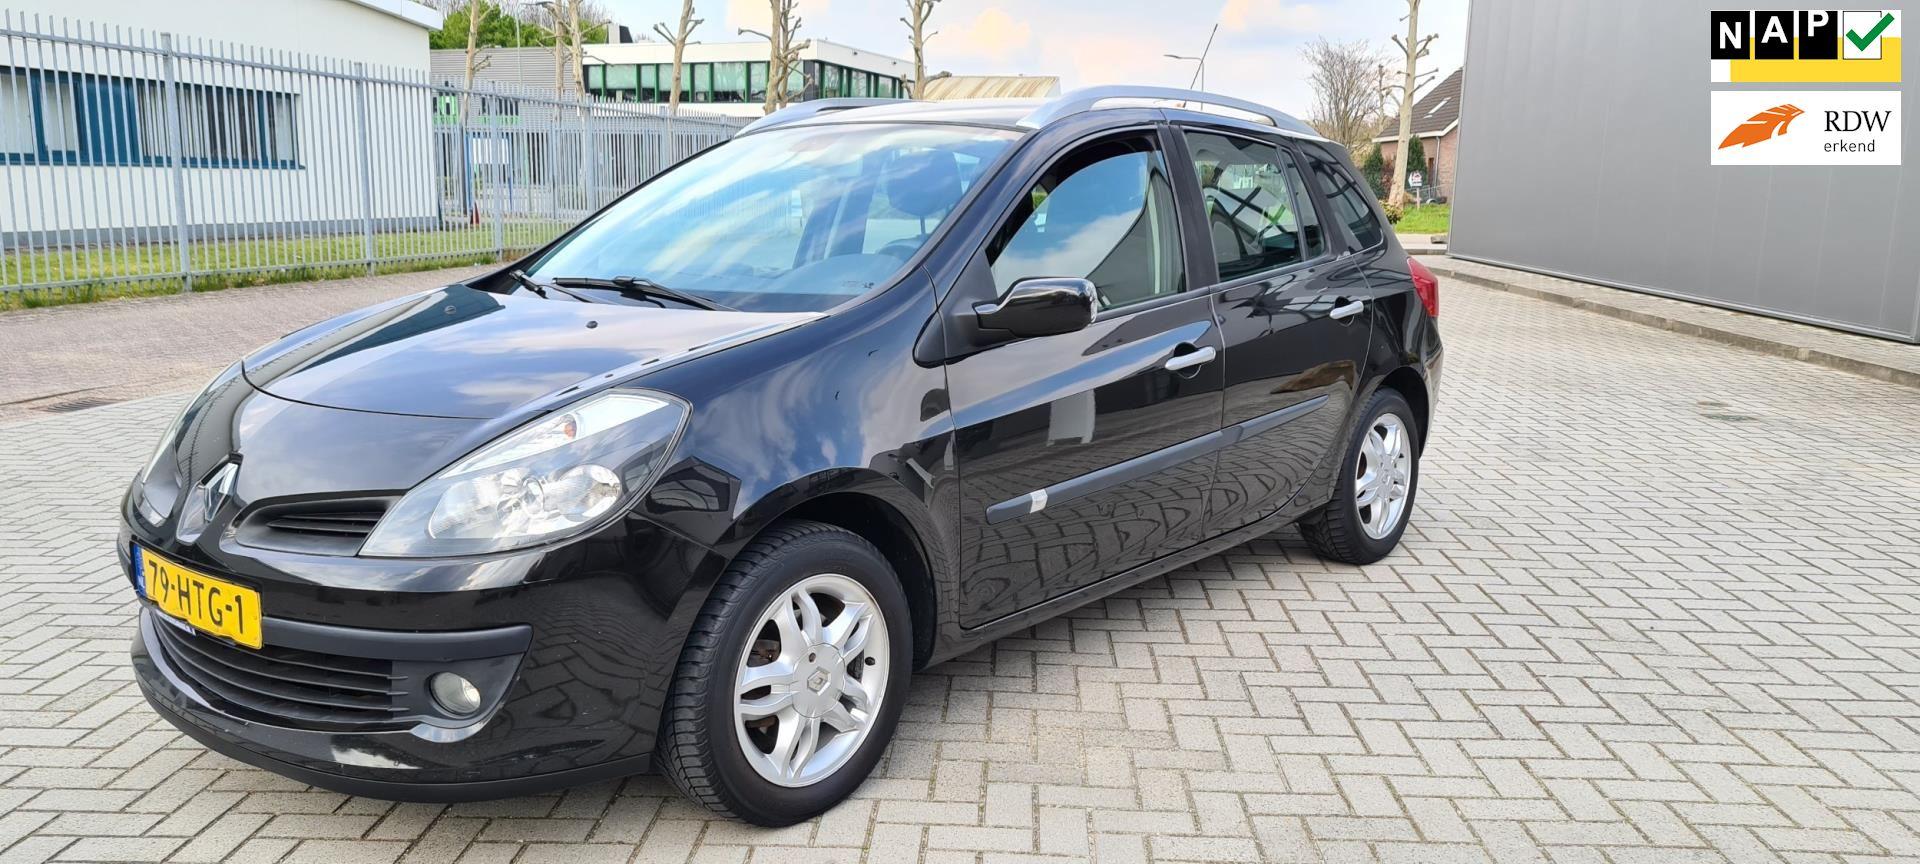 Renault Clio Estate occasion - Weerterveld Auto's